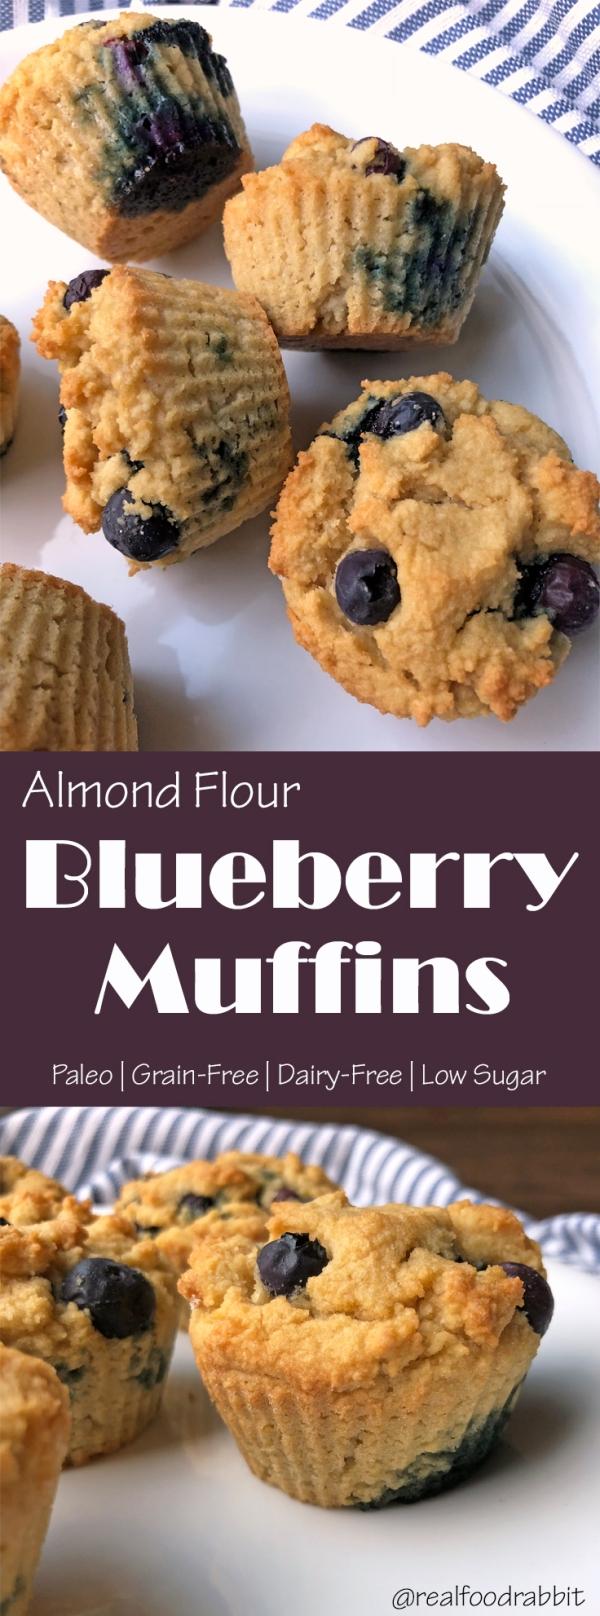 Almond Flour Blueberry Muffins.jpg